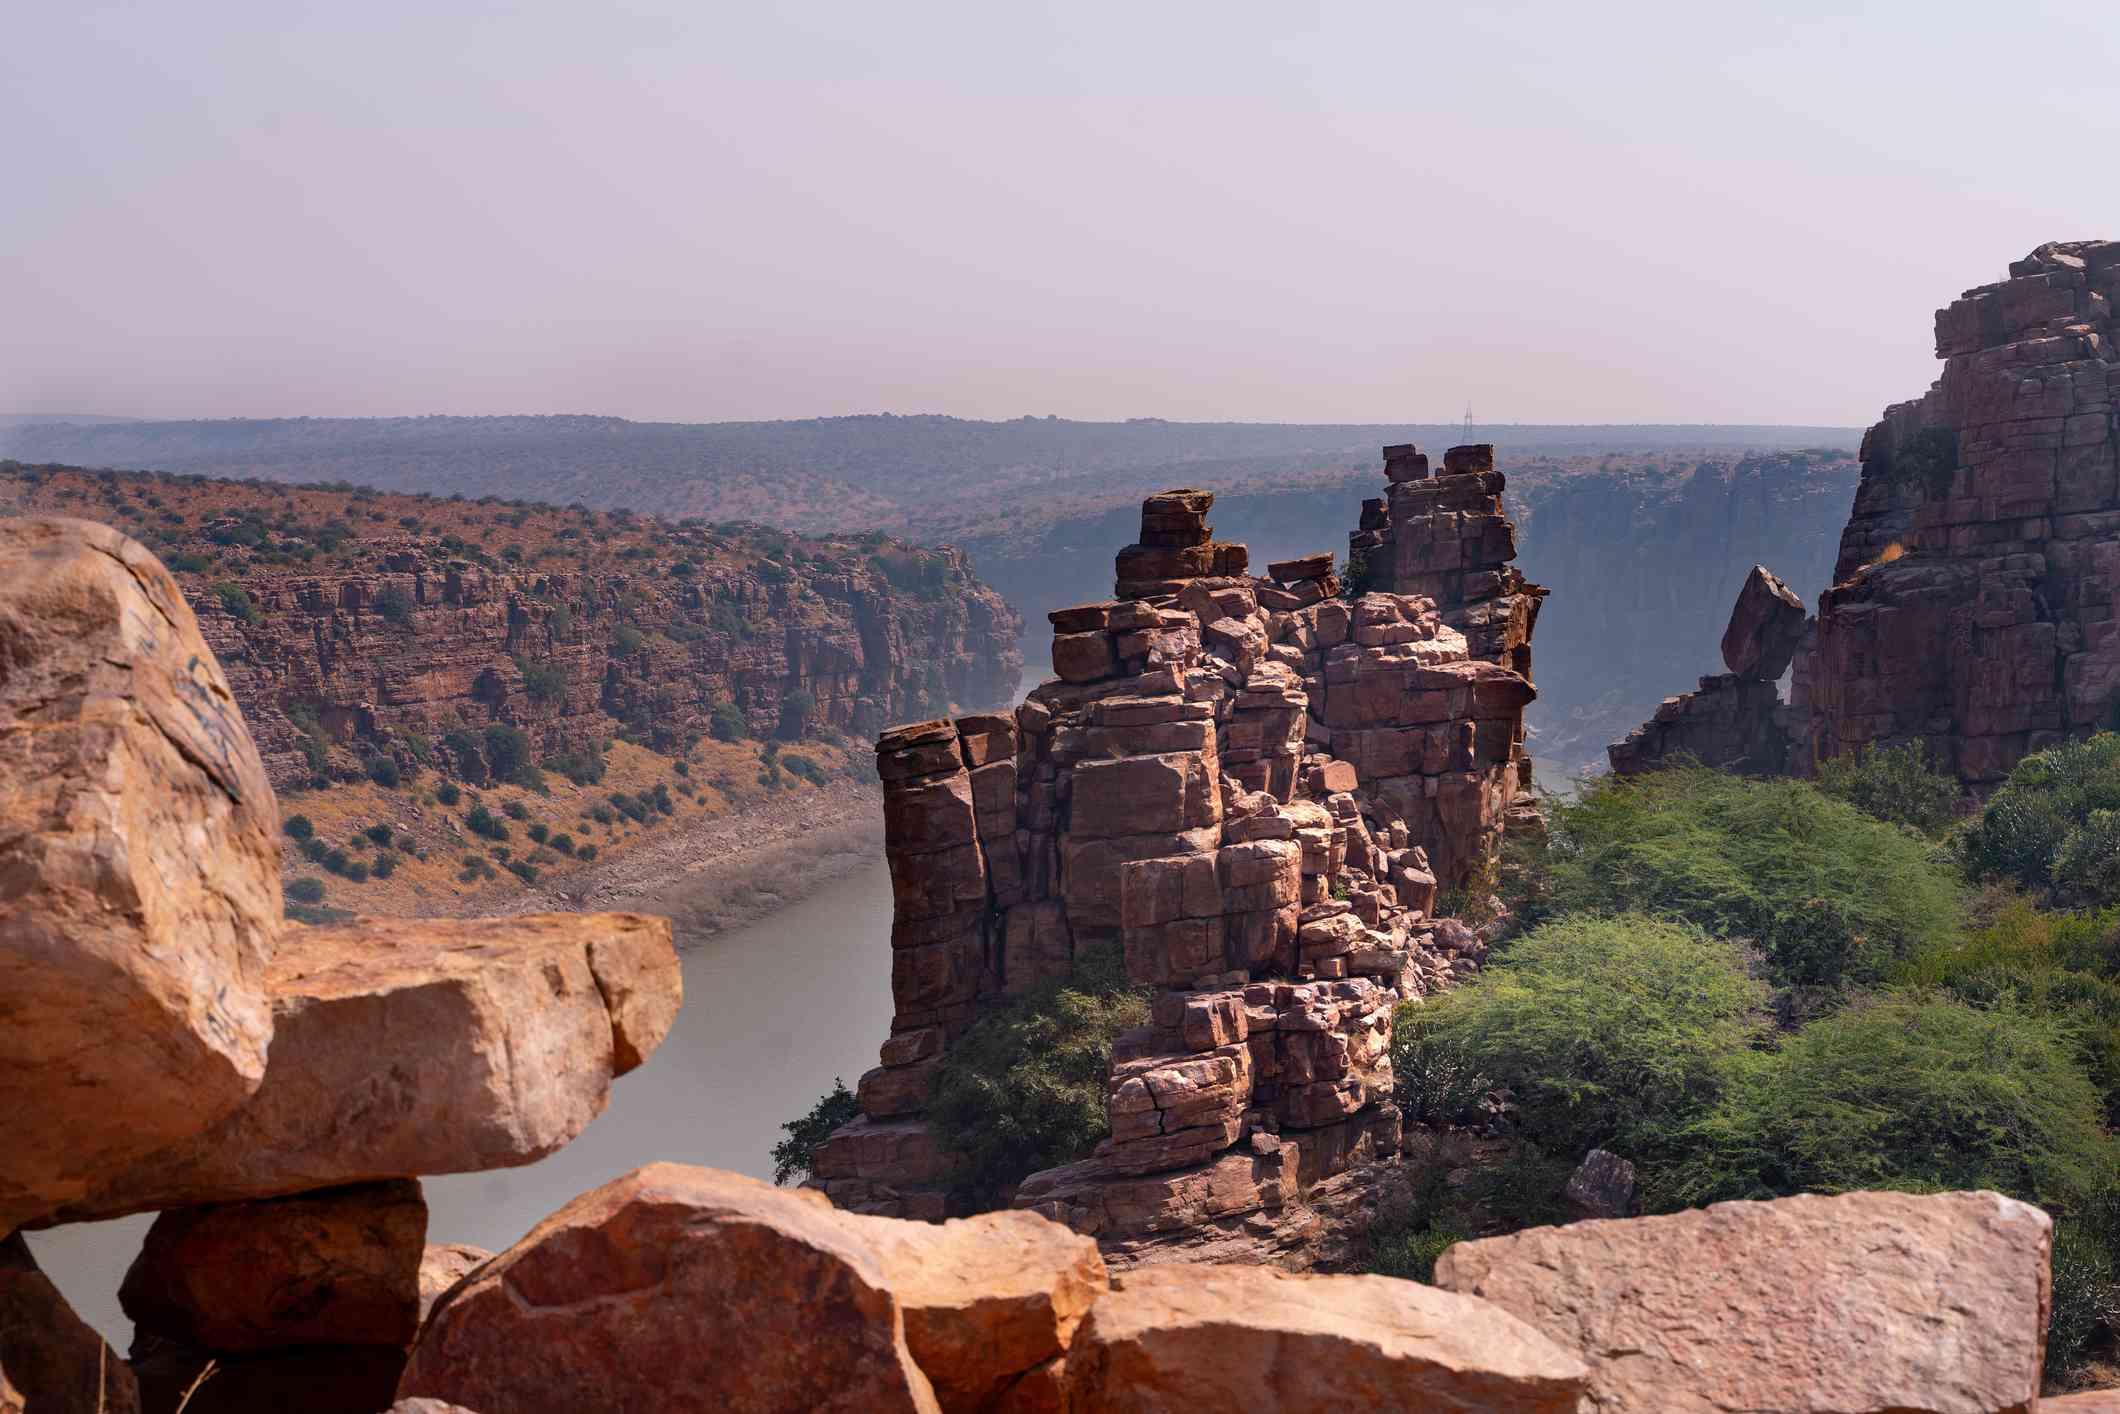 The great canyon in Gandikota